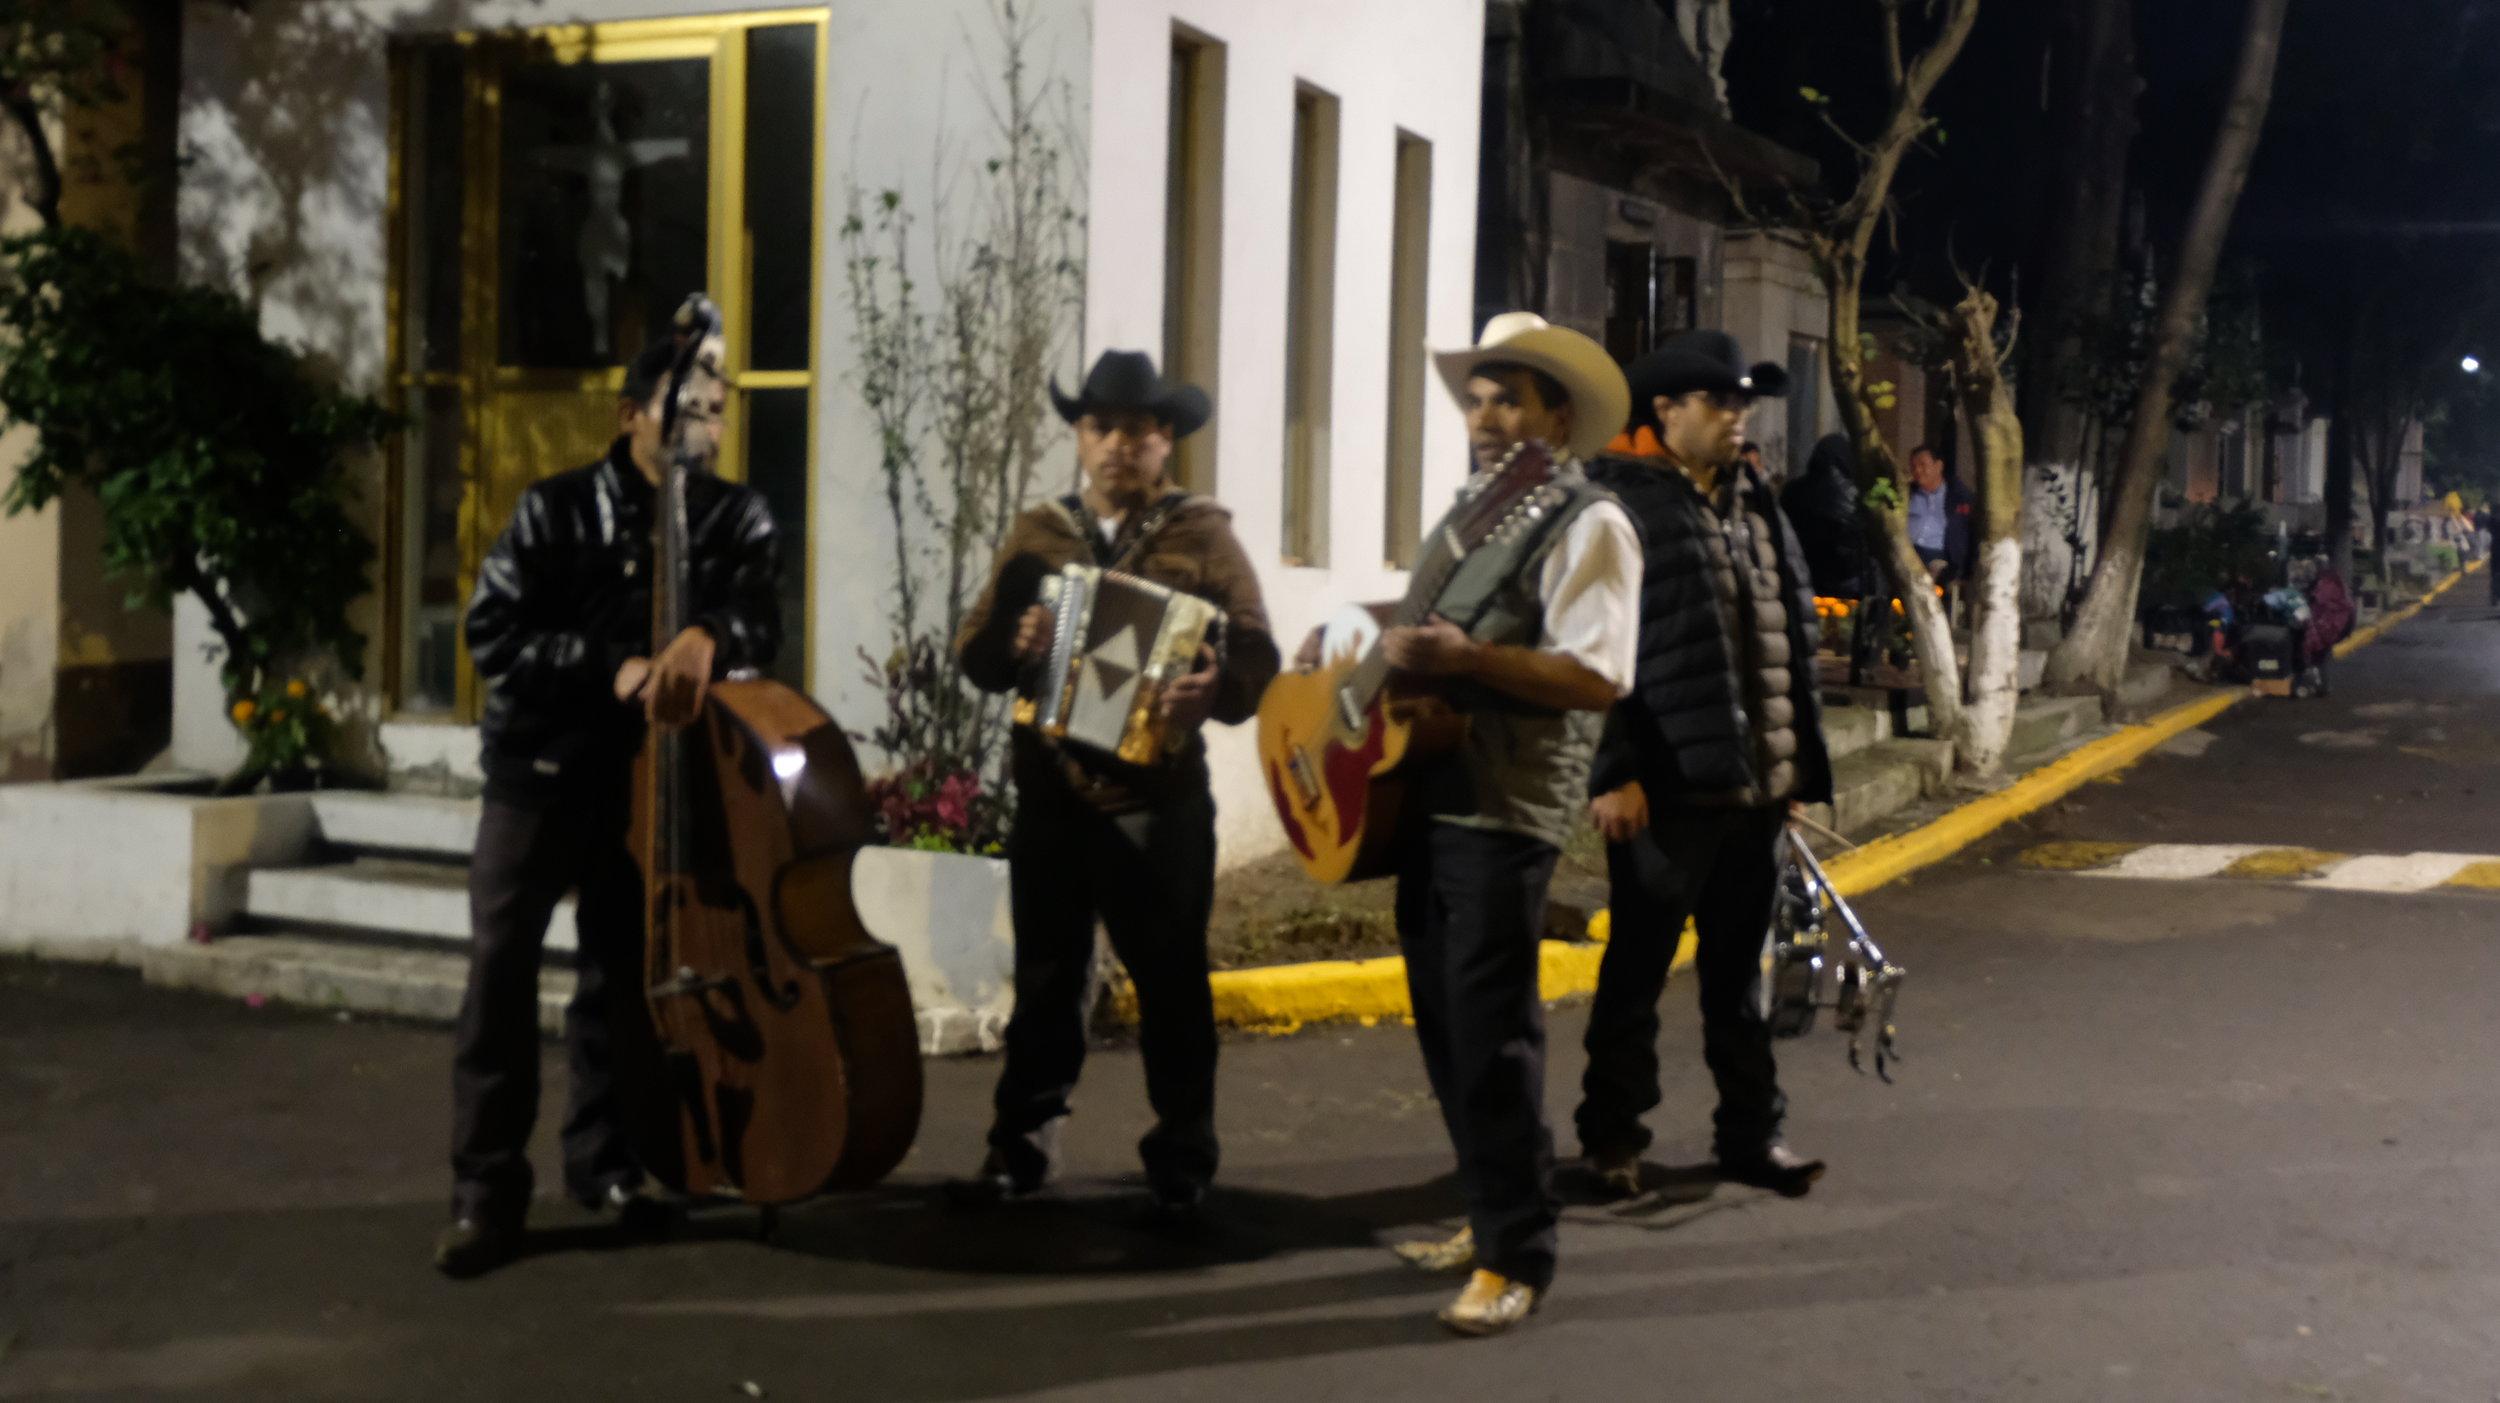 Rent-a-Mariachi band